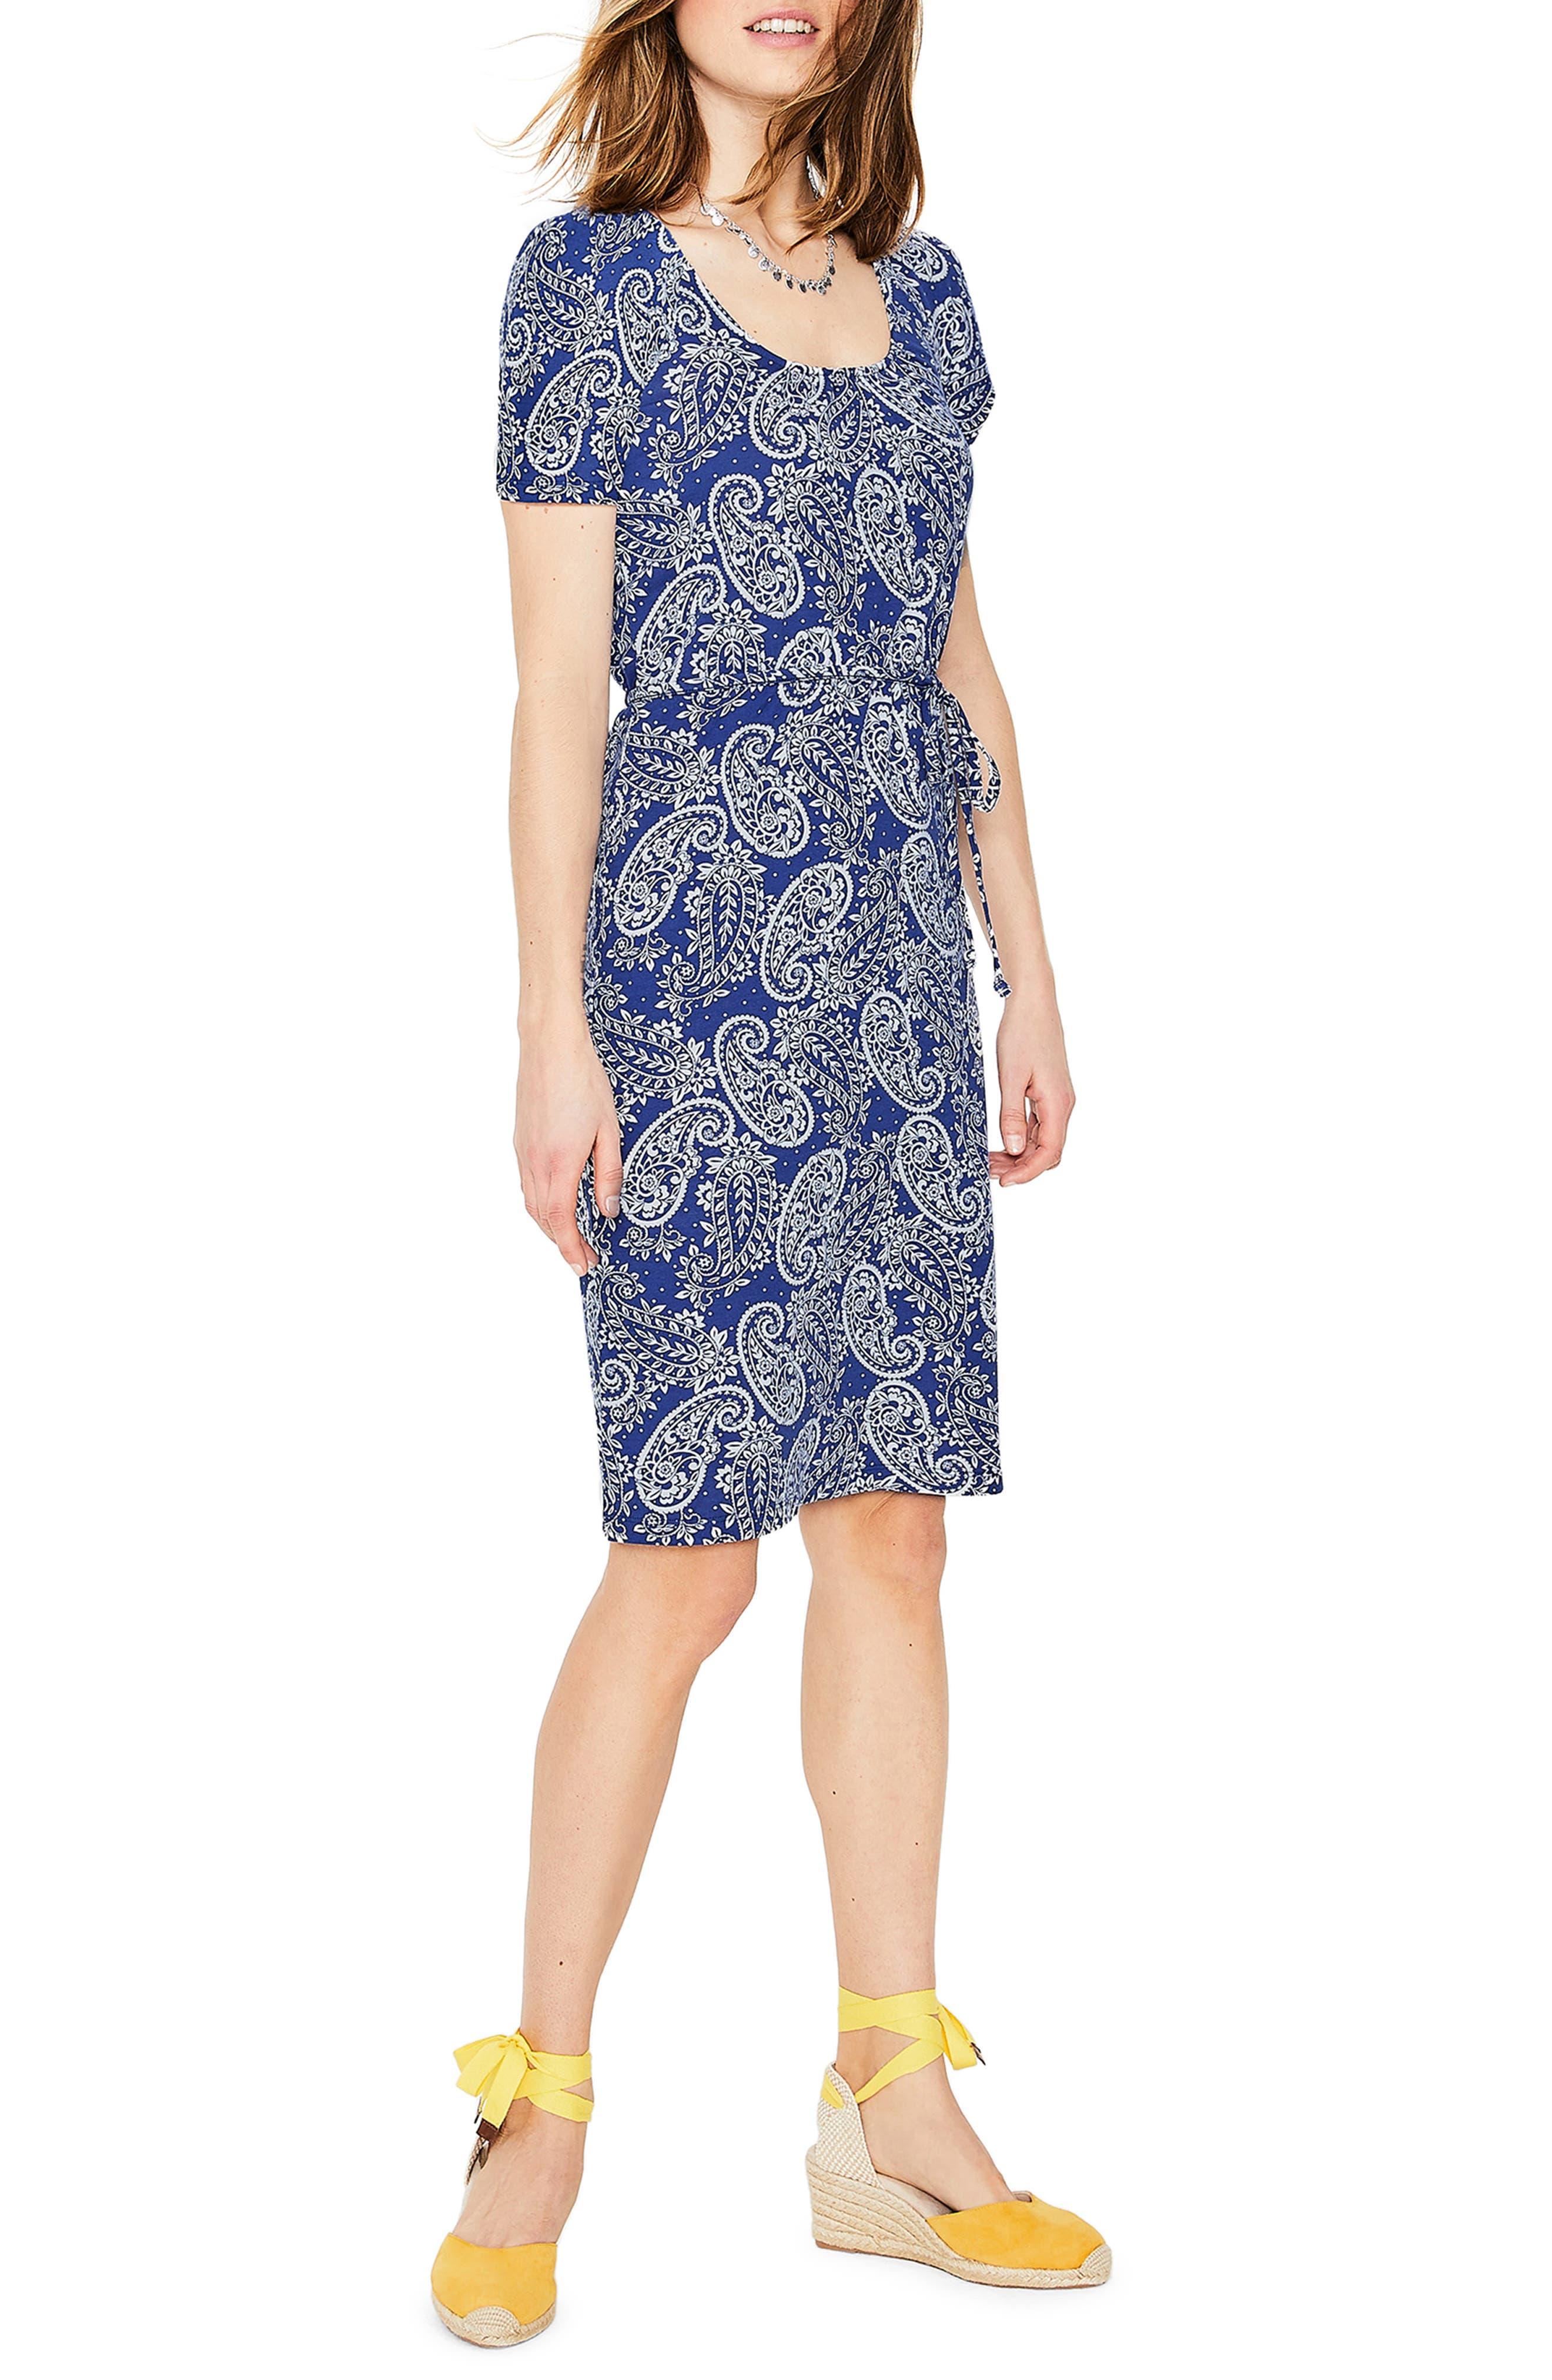 Boden Elspeth Paisley Cotton Blend Jersey Dress, Blue